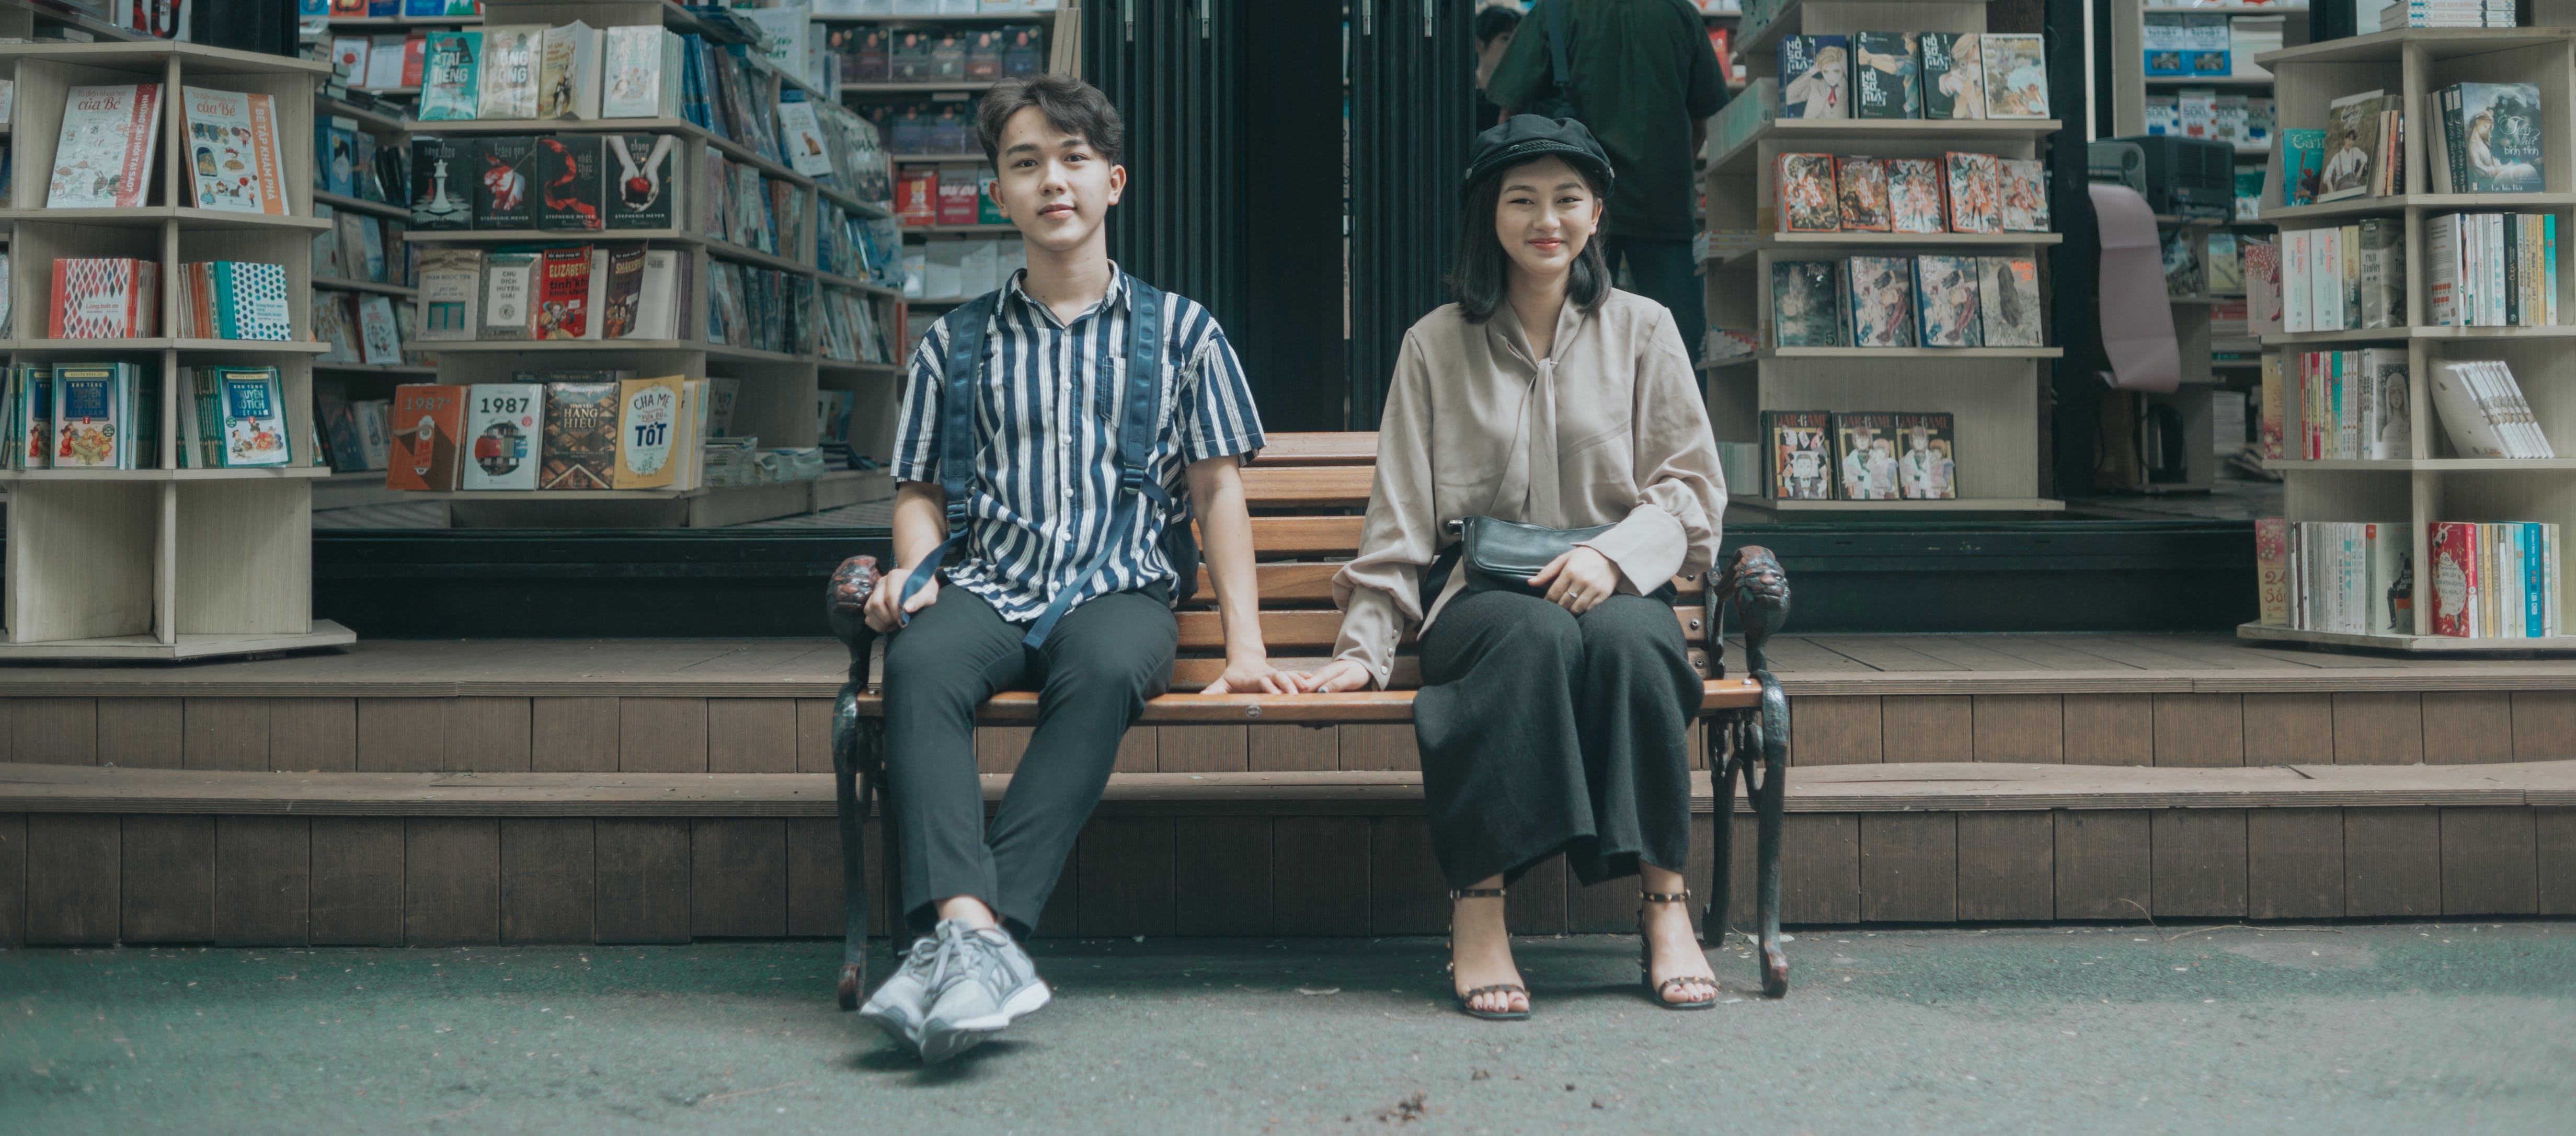 Free stock photo of couple, art, girl, book